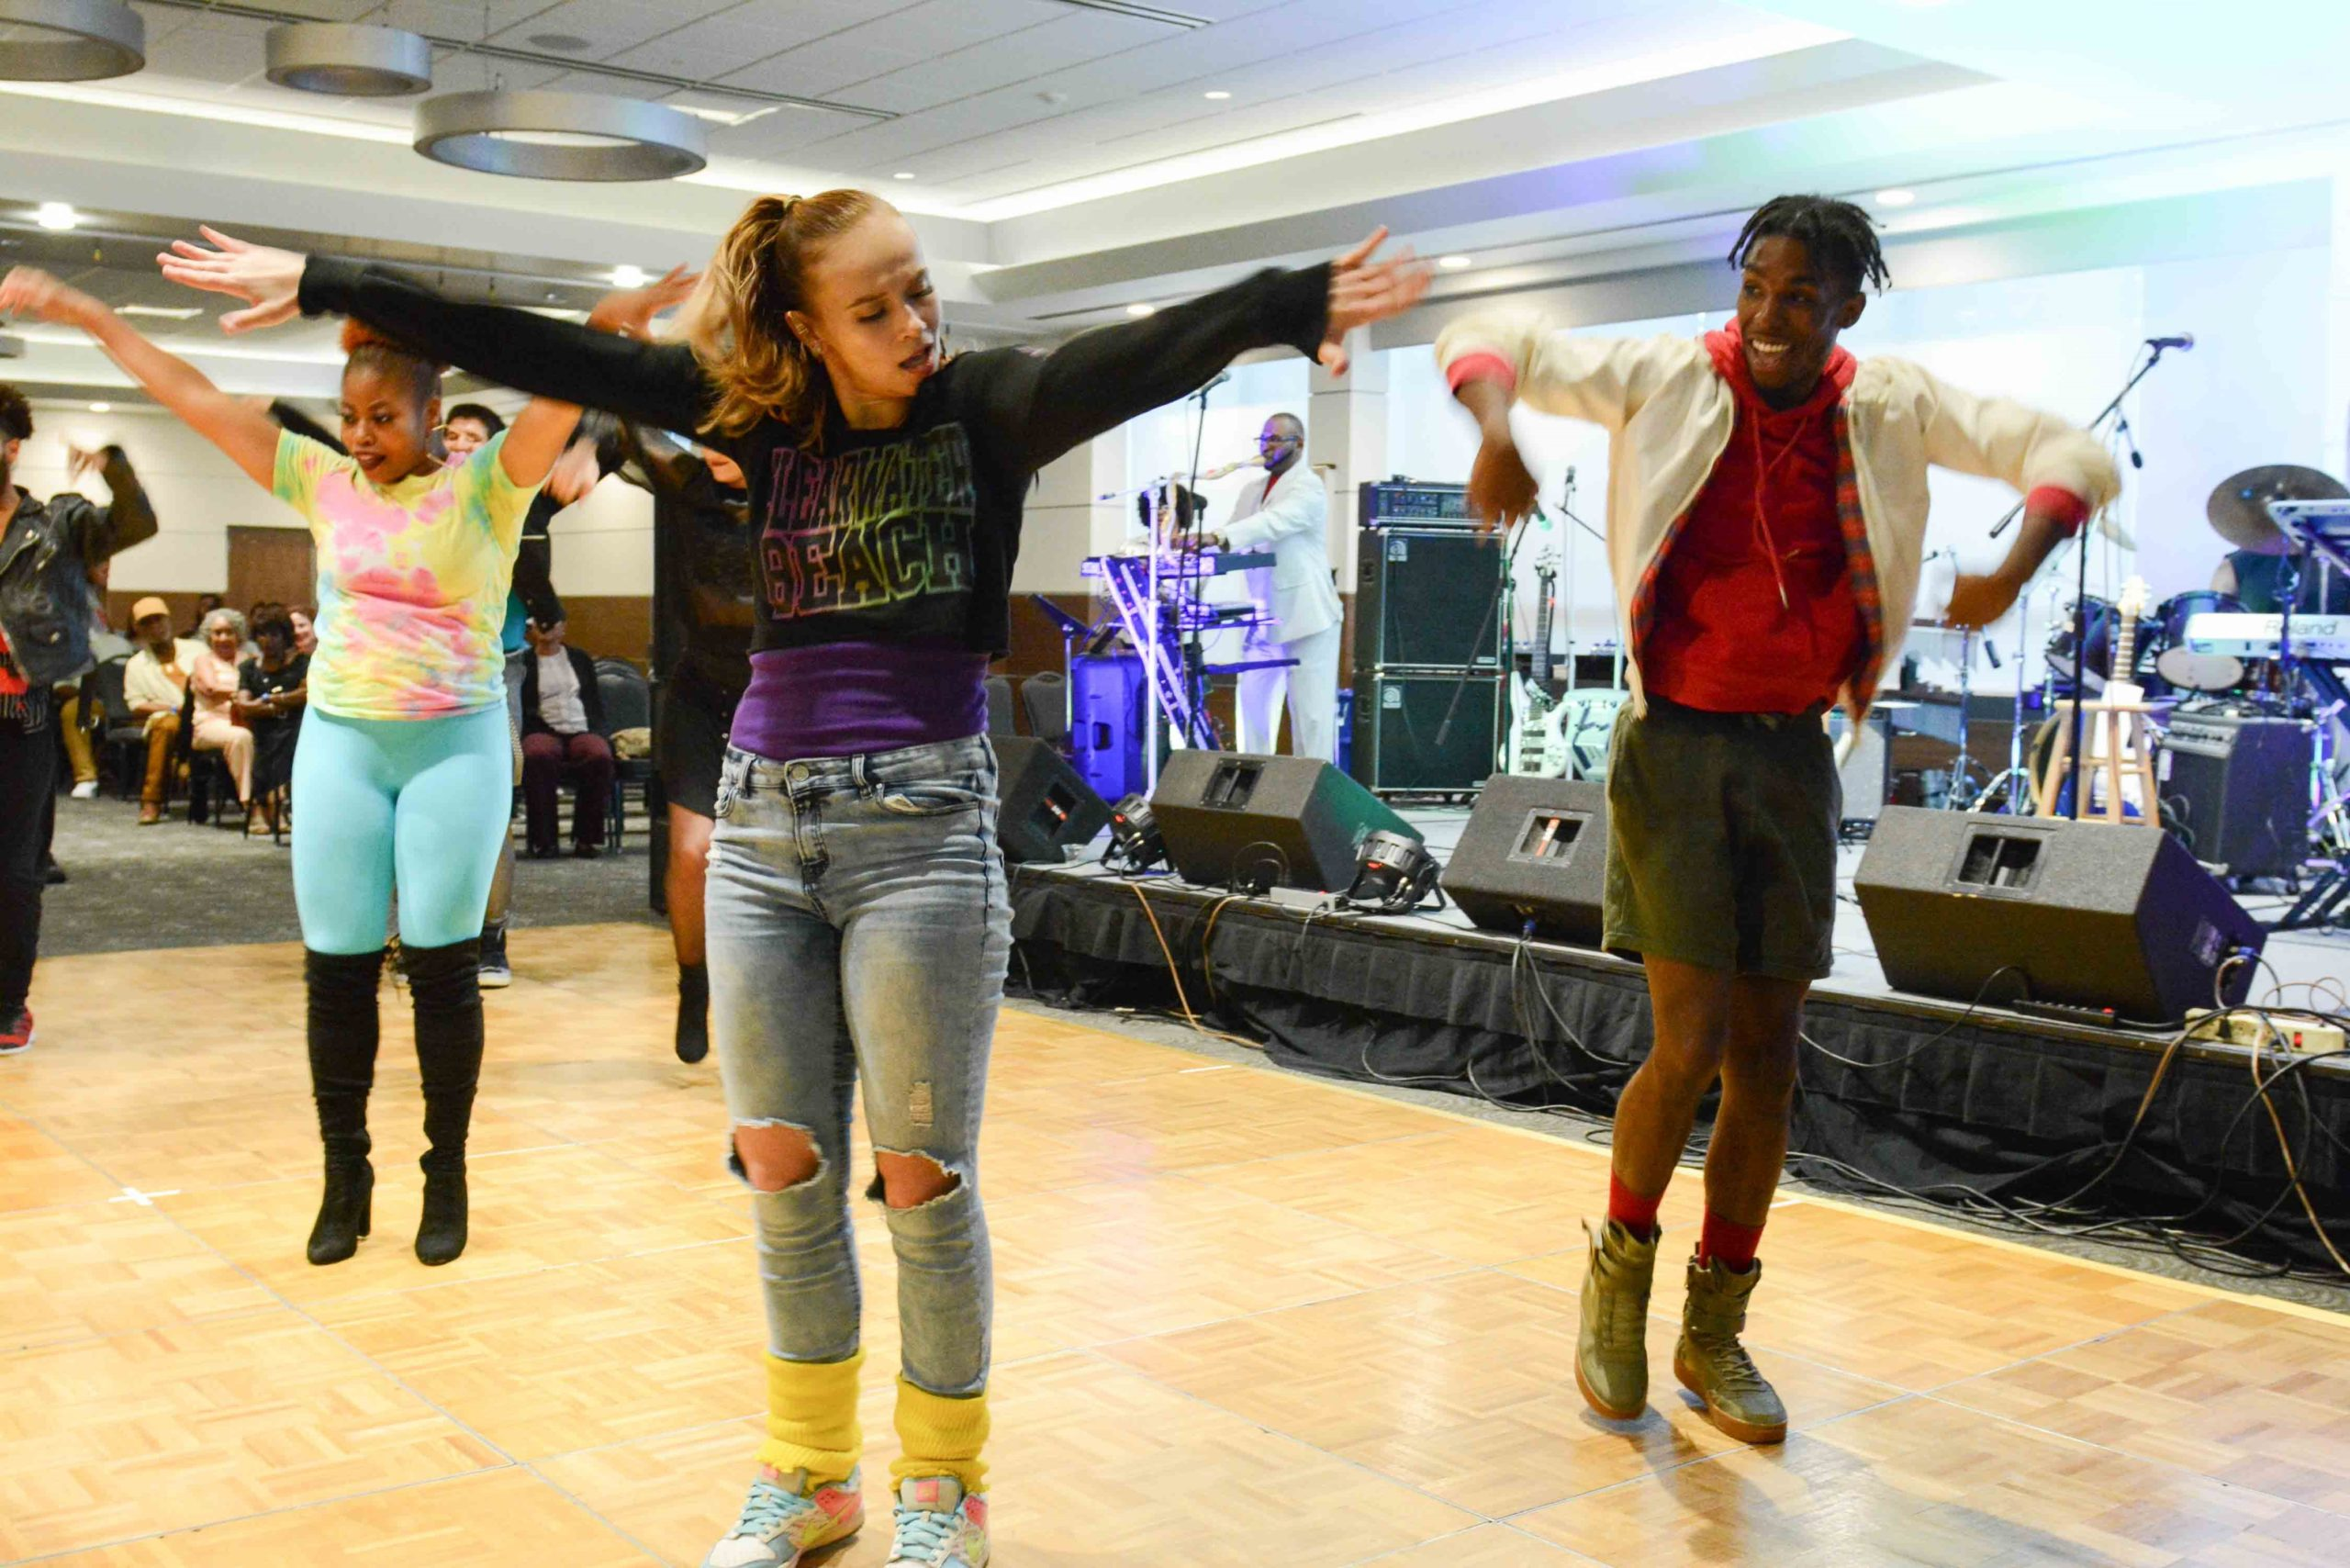 Dayton Contemporary Dance Company dancers demonstrating Funk dance styles at the University of Dayton's Dayton Funk Music Symposium